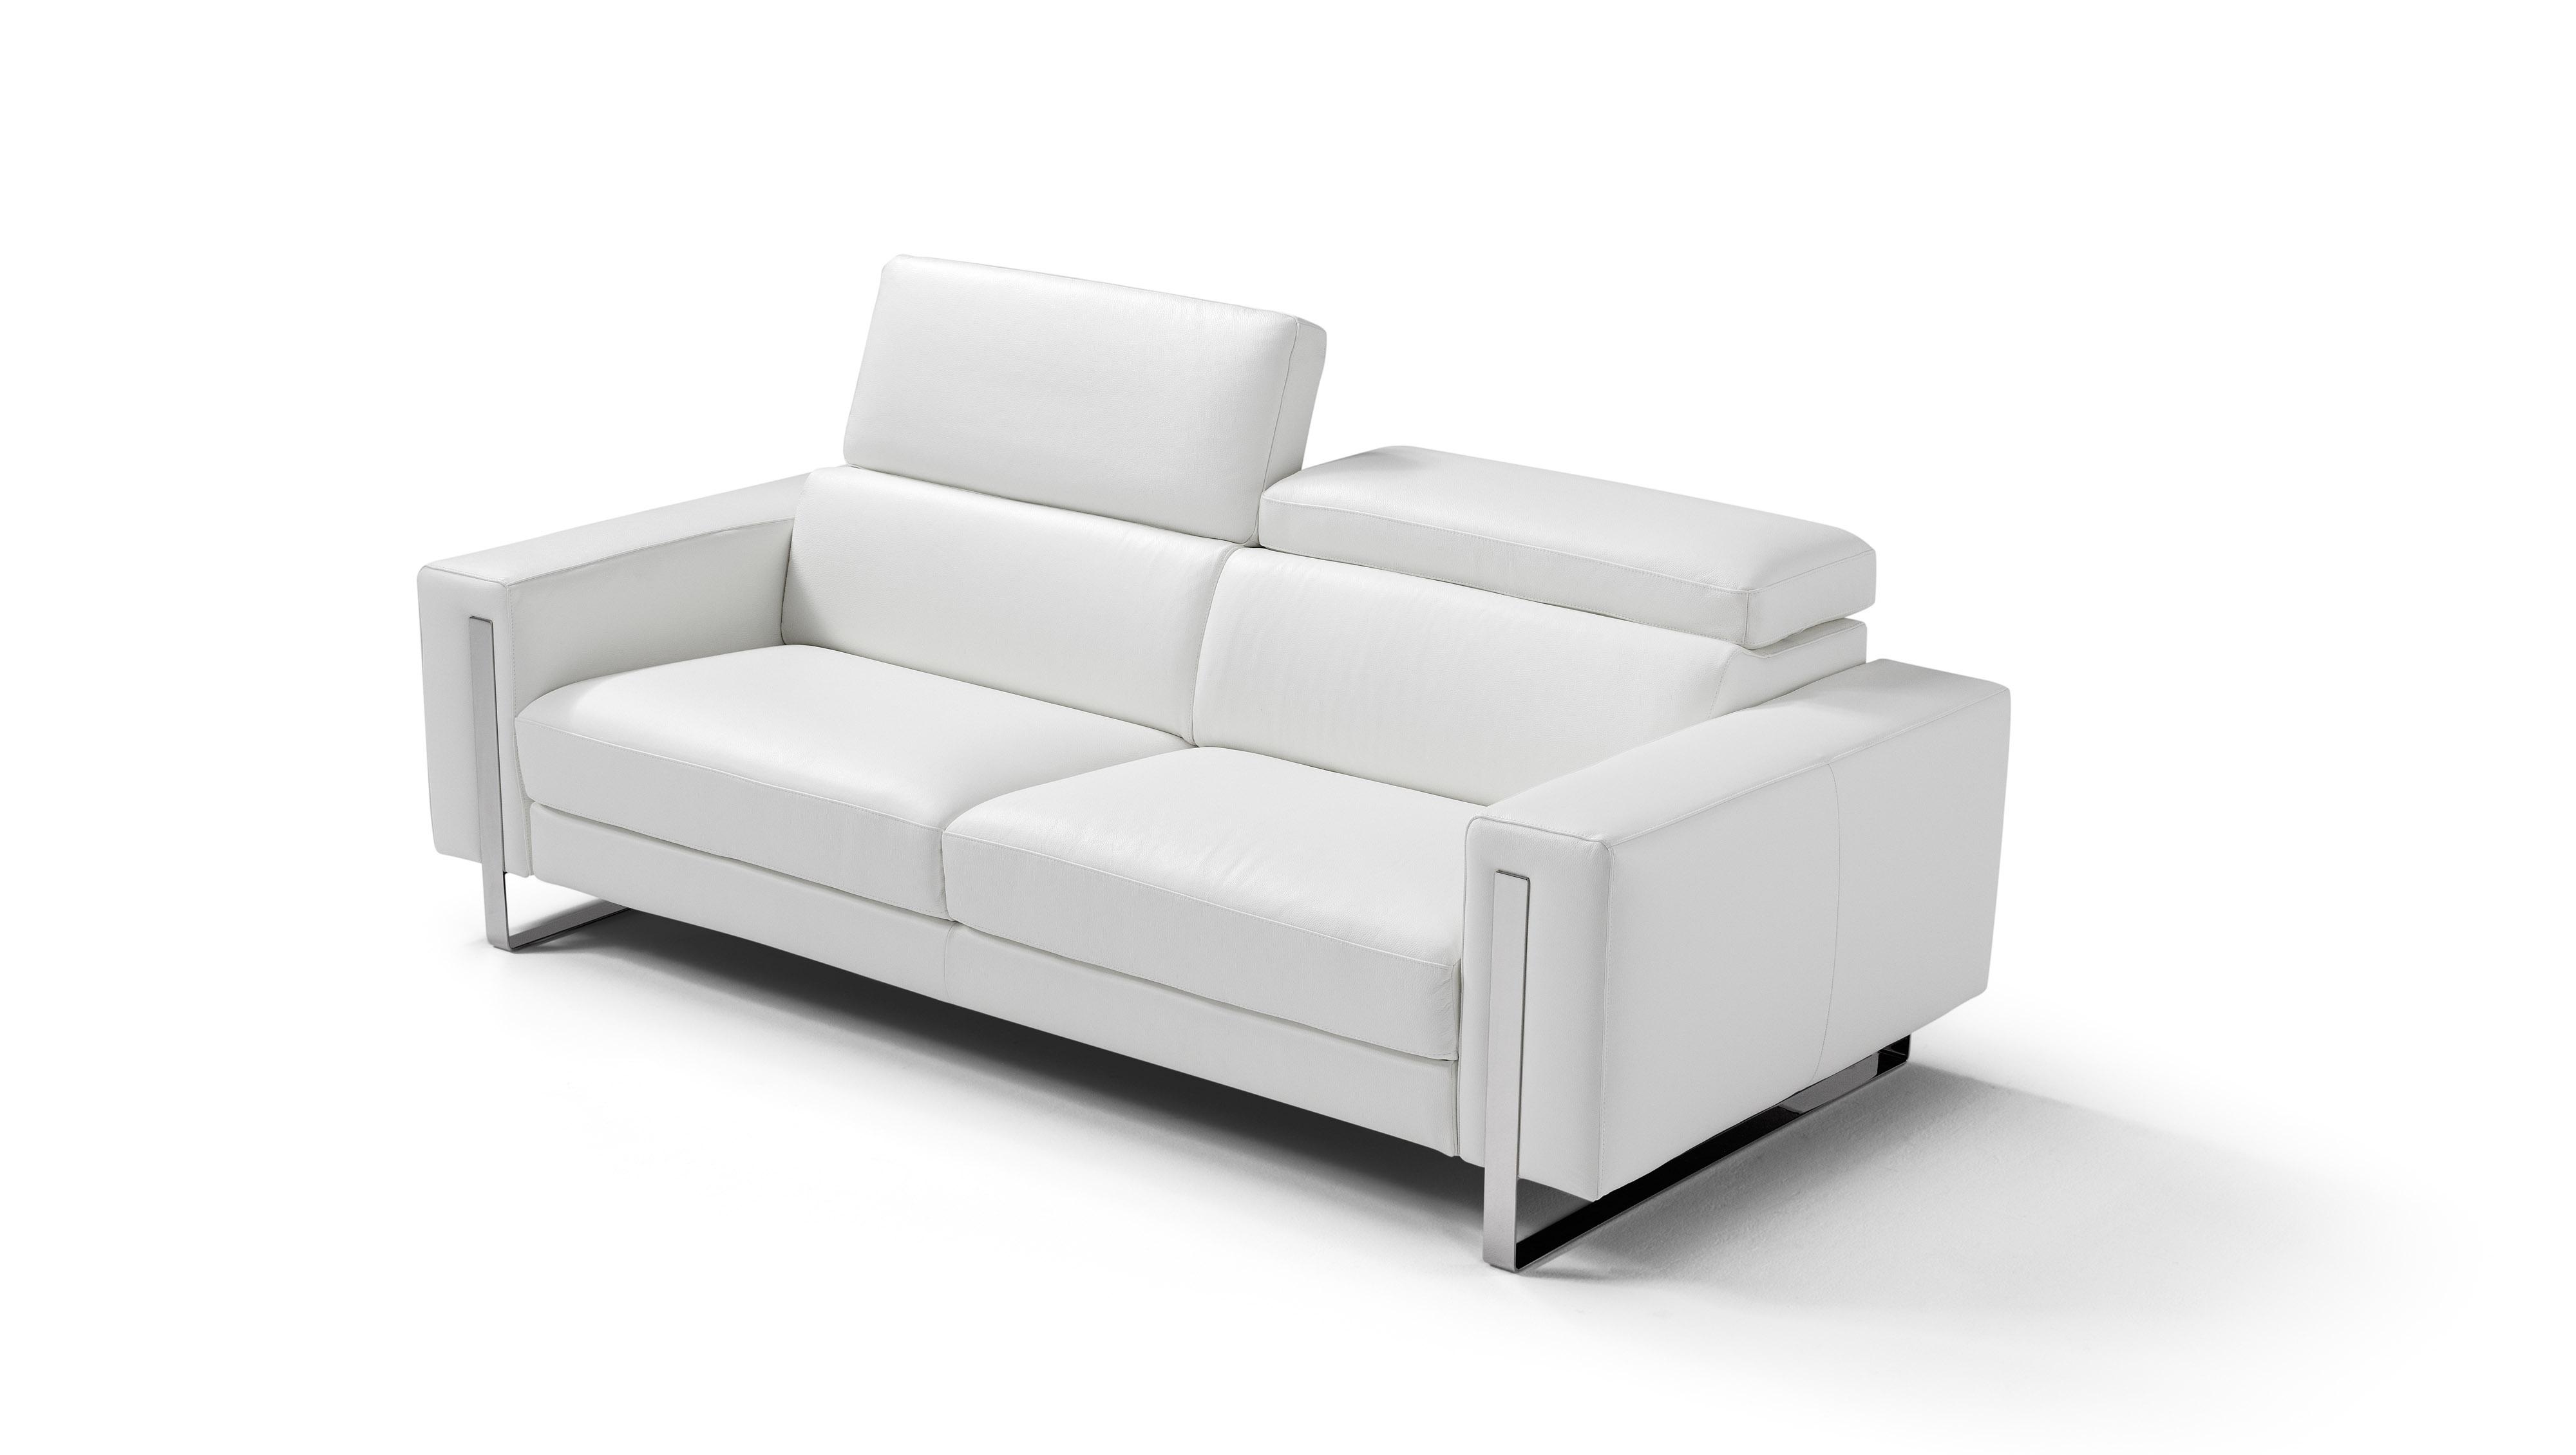 living room furniture dallas tx country wall decor for classic italian texas whiteline sku 303728